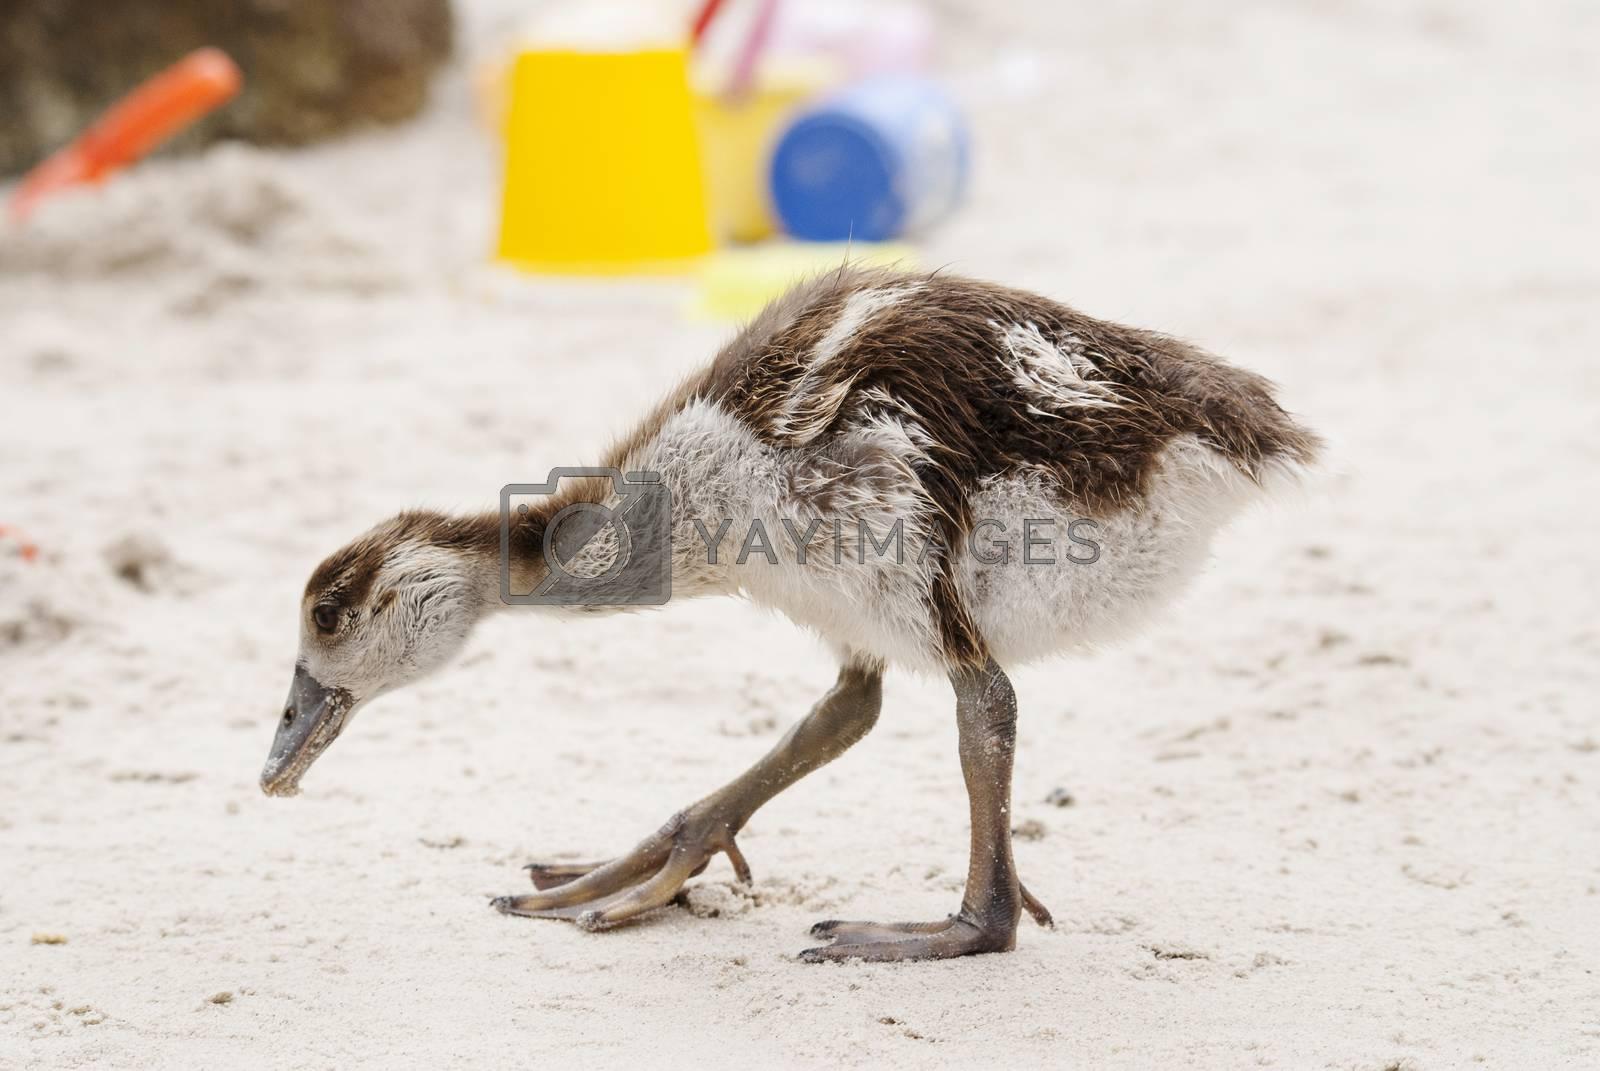 An Egyptian gosling pecks around a public beach